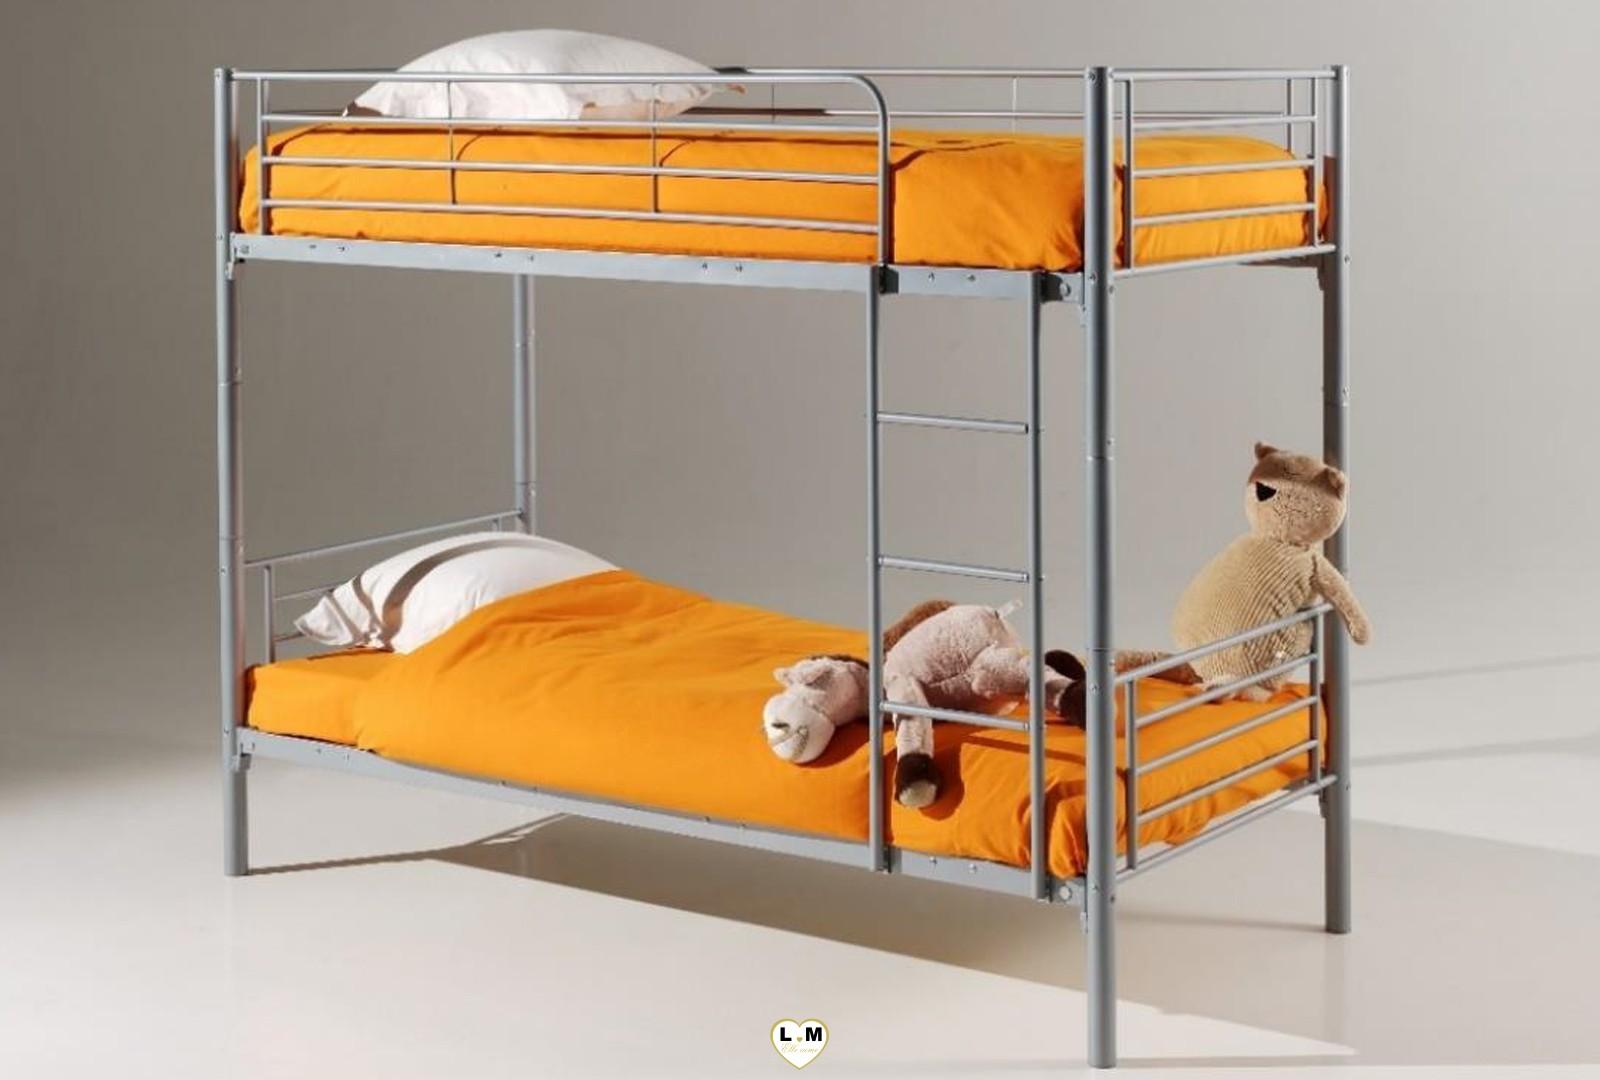 Caramel lit superpose metal 1 1 gris lignemeuble com - Securite pour lit superpose ...